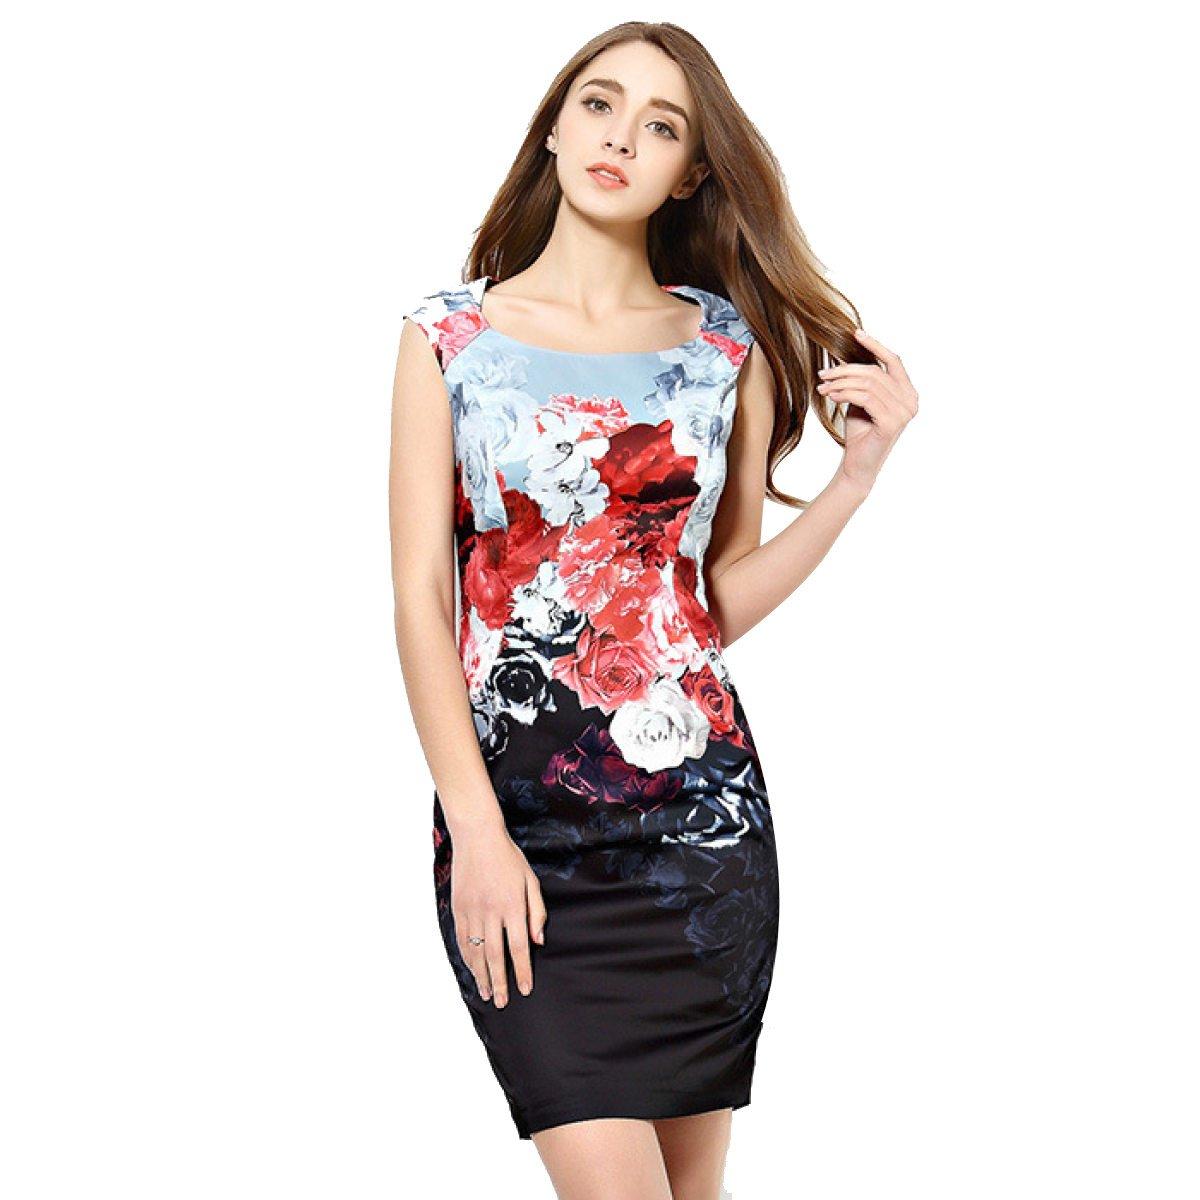 China Palaeowind Women Spring And Summer Fashion Retro Slim High Waist Dress,Color-